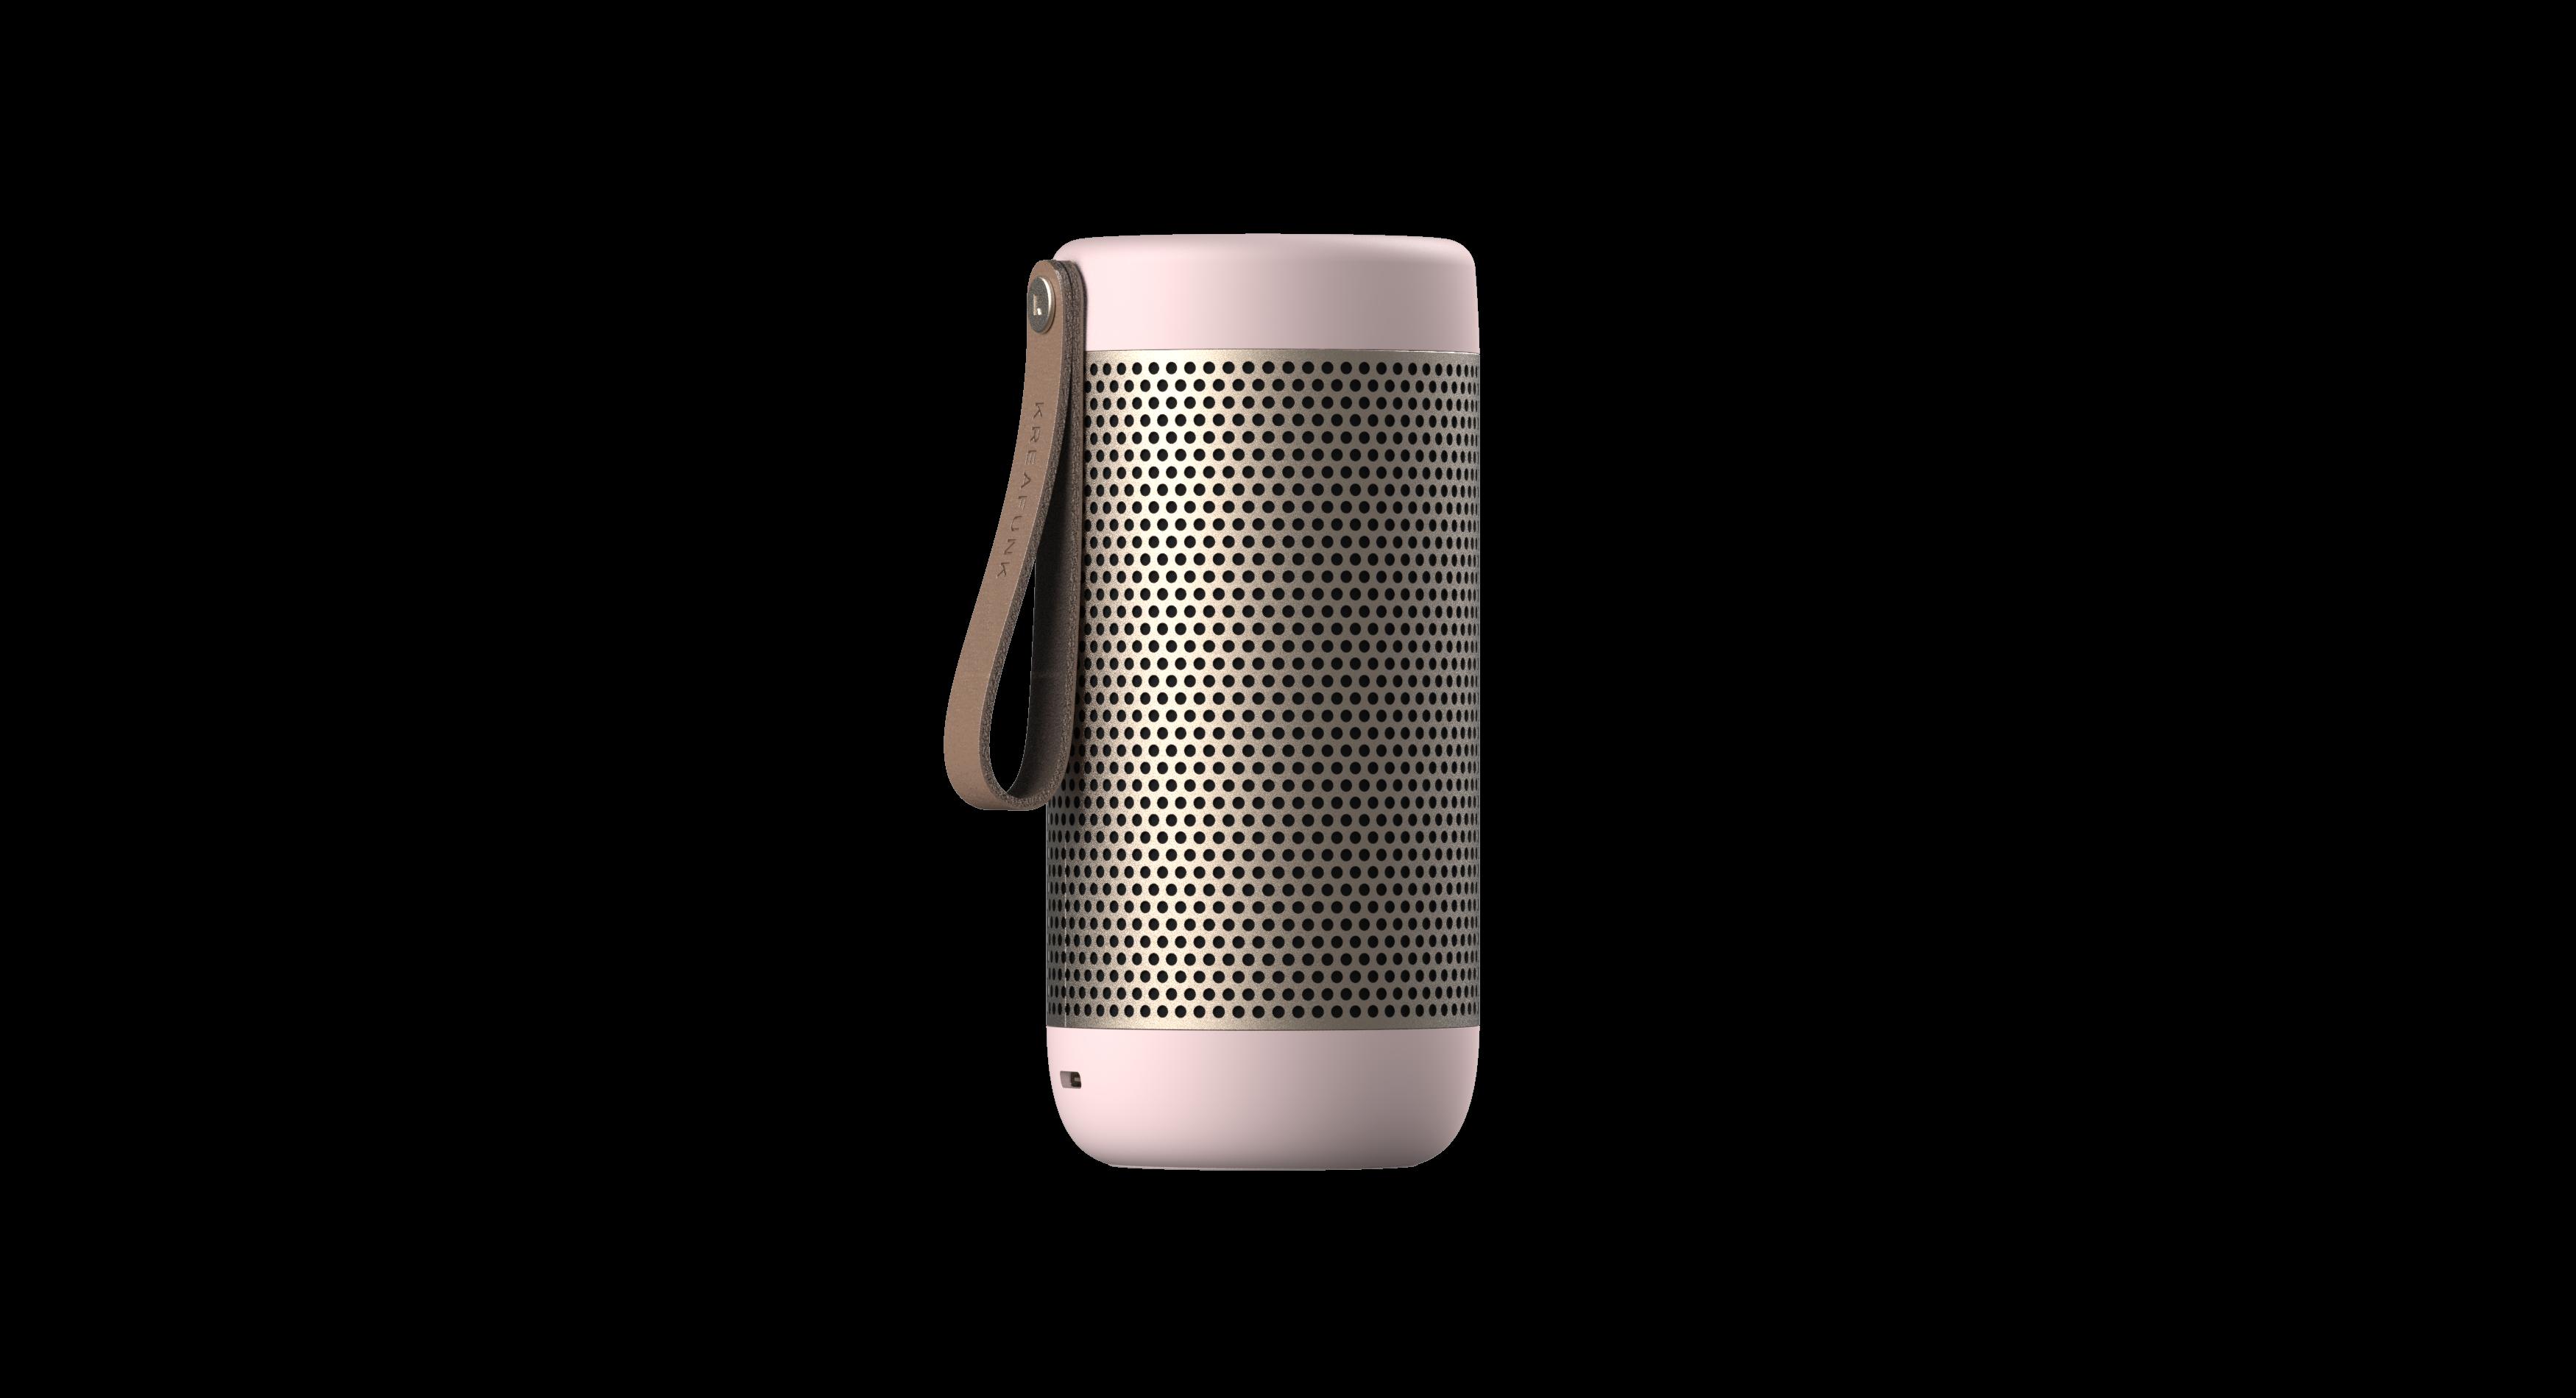 KreaFunk - aCOUSTIC Bluetooth Speaker - Dusty Pink (Kfwt43)